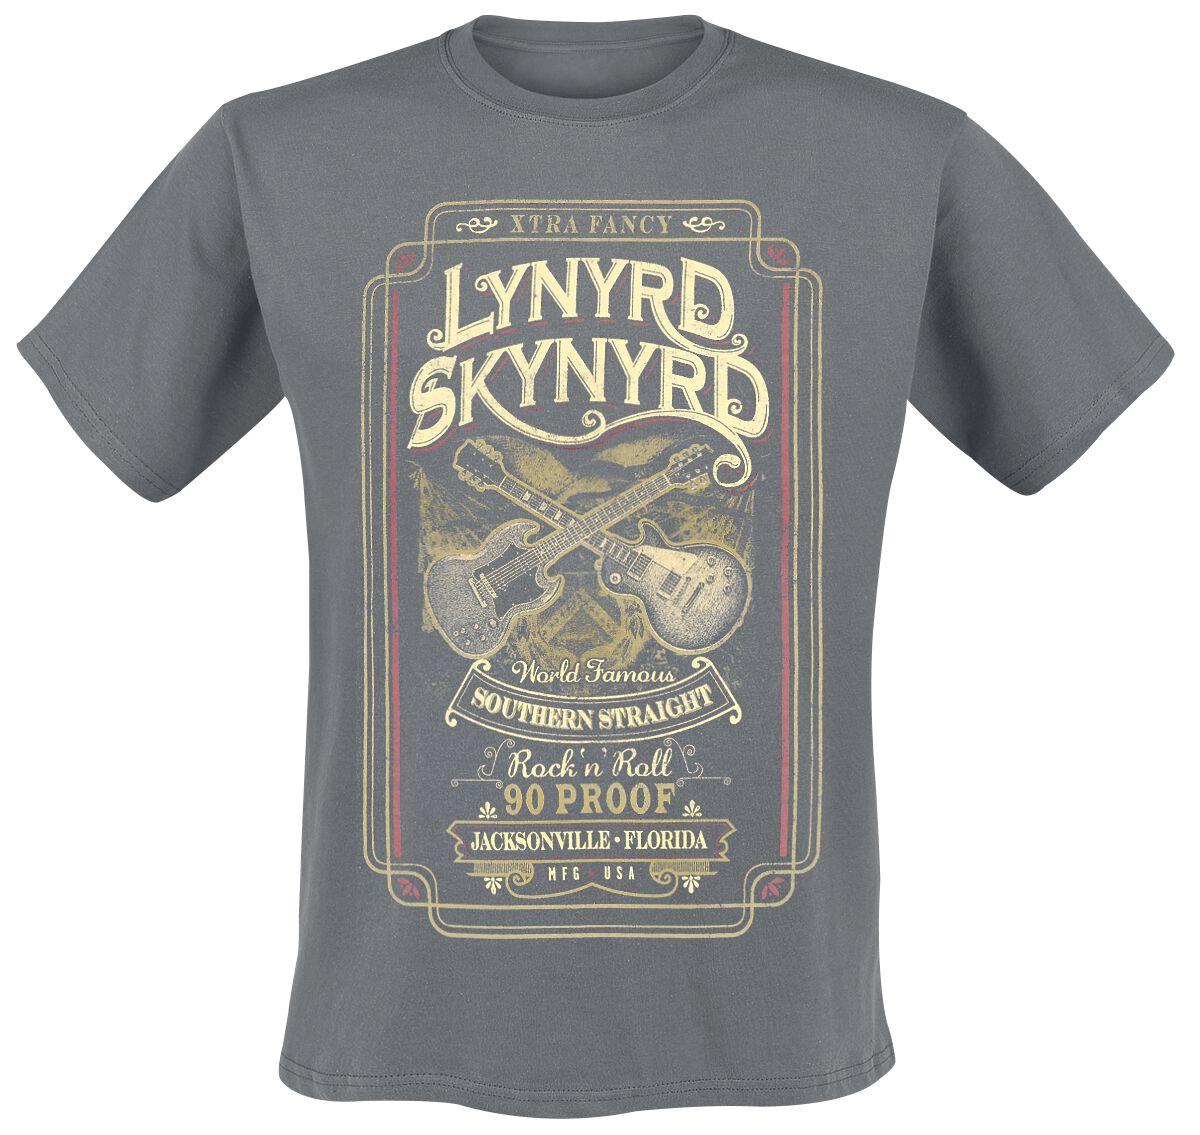 9a2fb67b Lynyrd Skynyrd. Southern Straight. T-Shirt. 5 Reviews